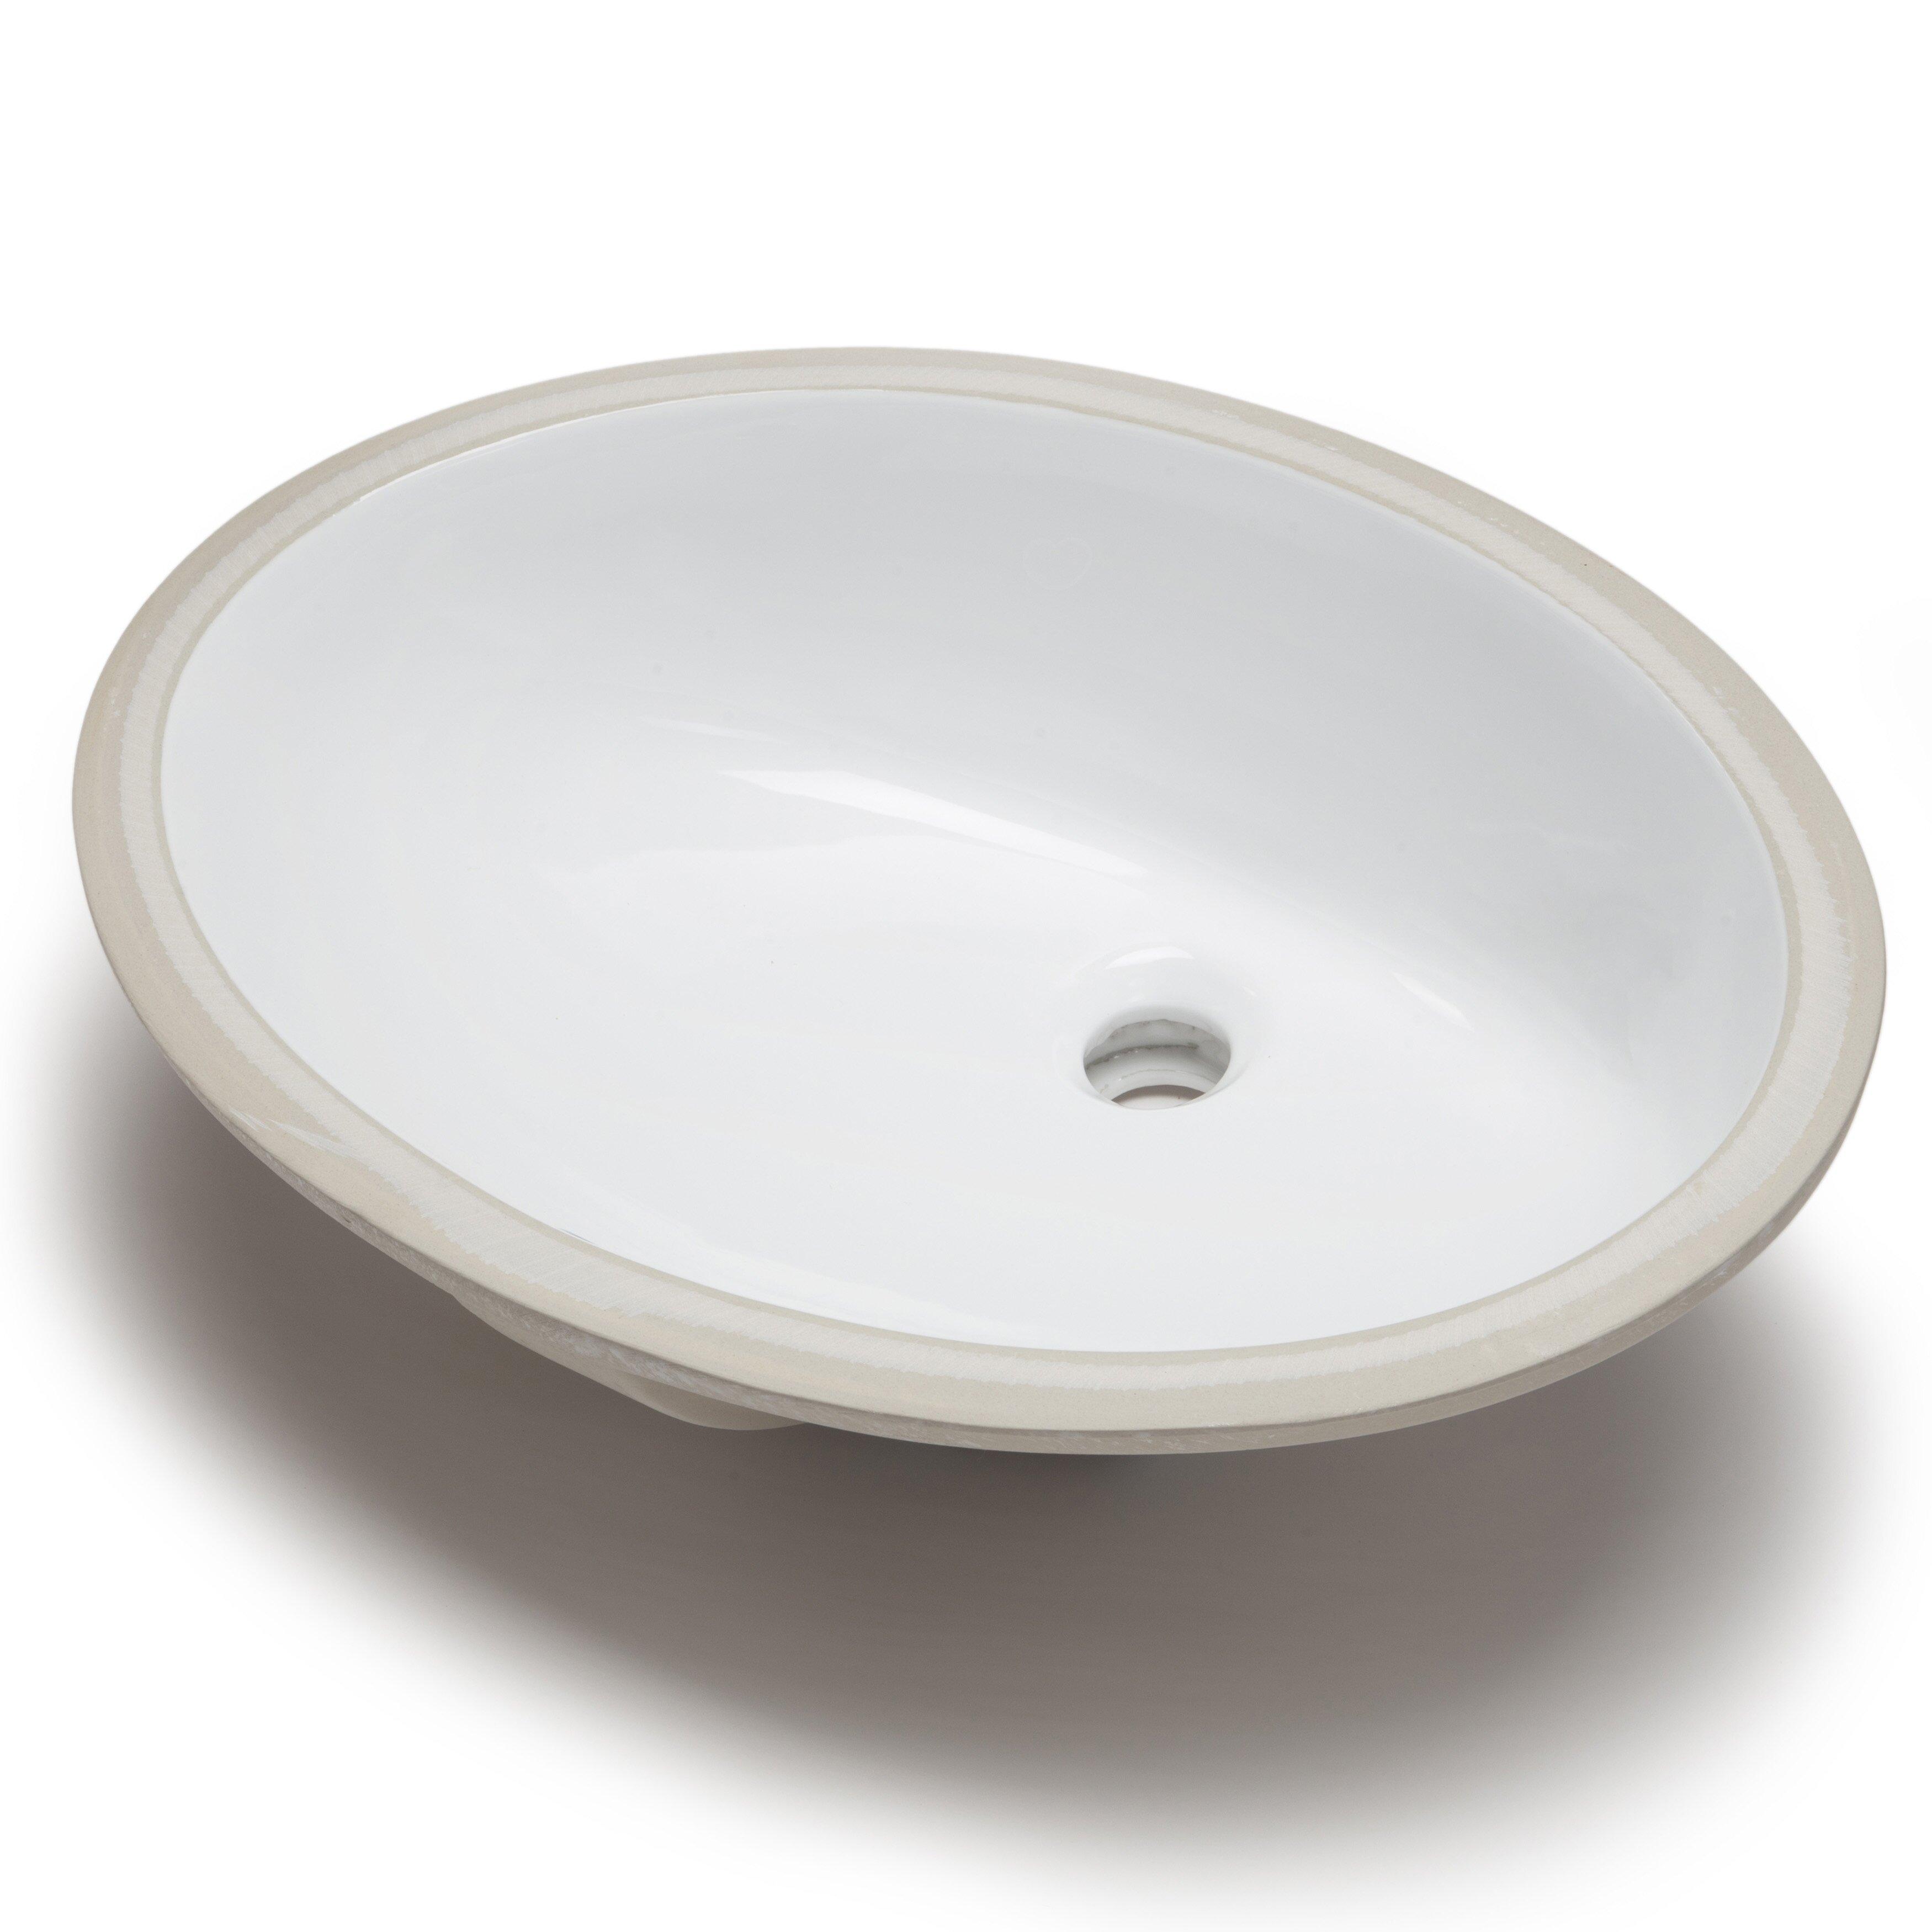 Bathroom Sink Bowls : Home Improvement Bathroom Fixtures ... Hahn Part #: VC009 / VC010 SKU ...